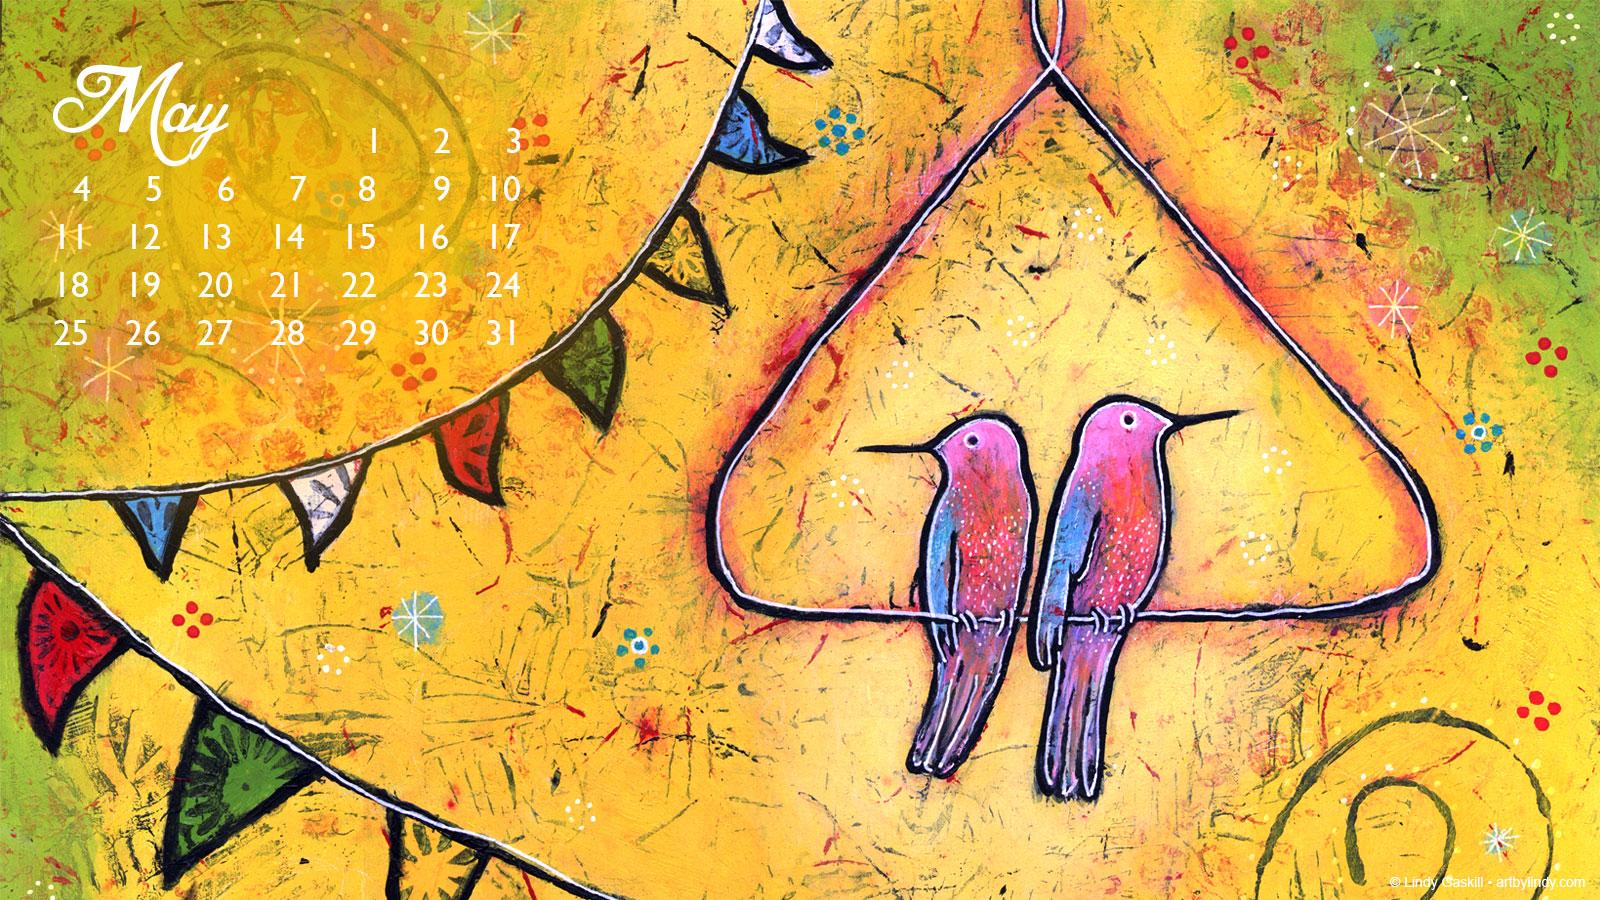 desktop wallpaper Archives - Art by Lindy